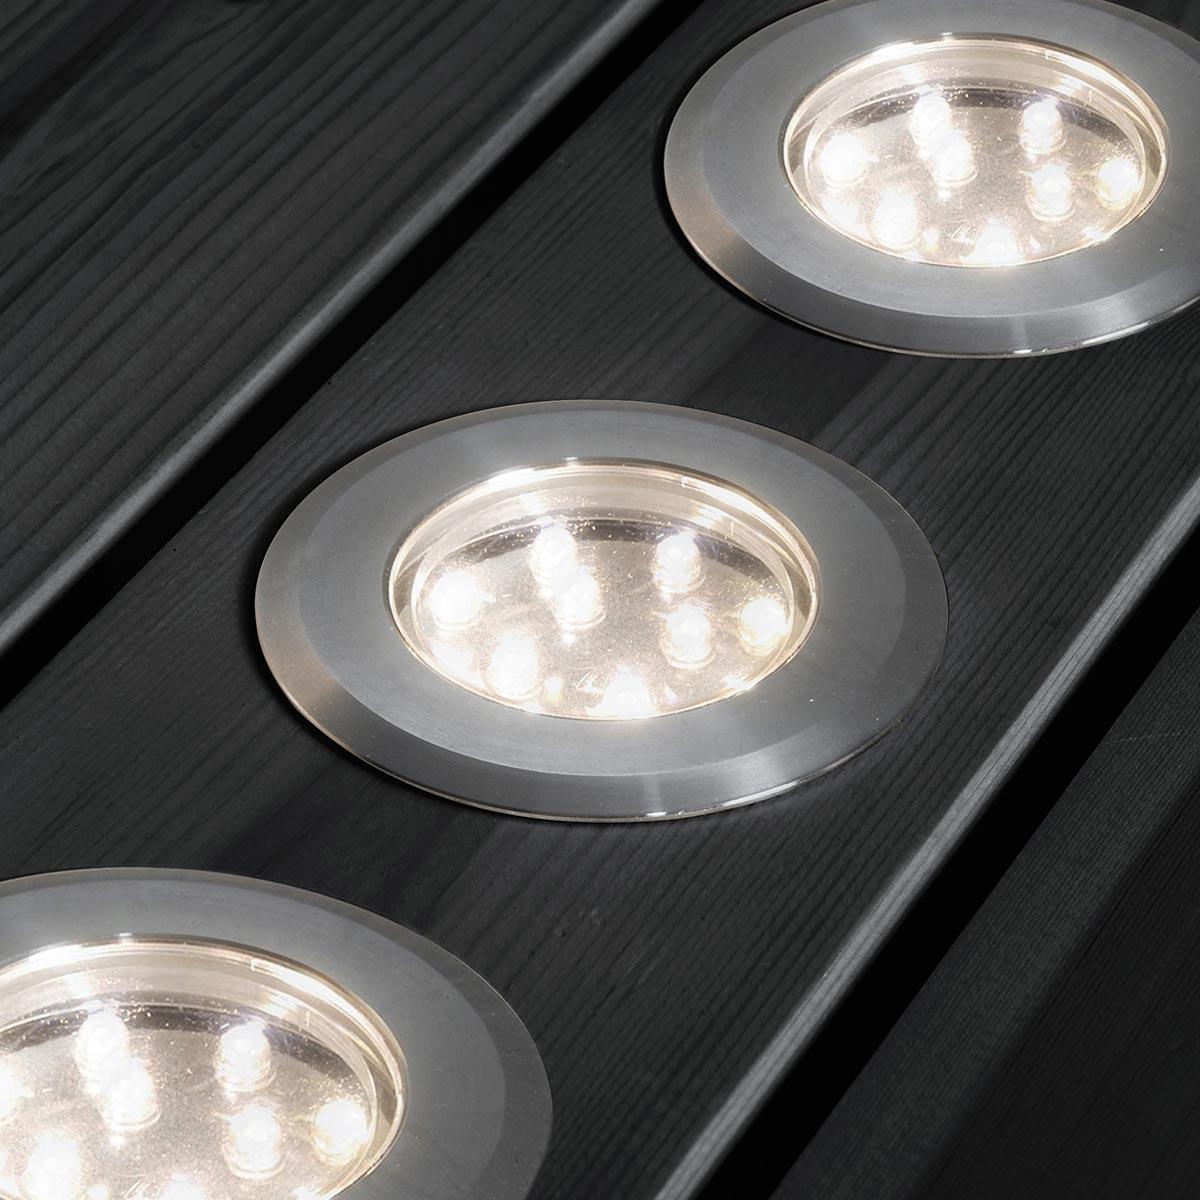 led mini bodenspots set 3 teilig aus edelstahl warmweiss ip44 3x12lm. Black Bedroom Furniture Sets. Home Design Ideas